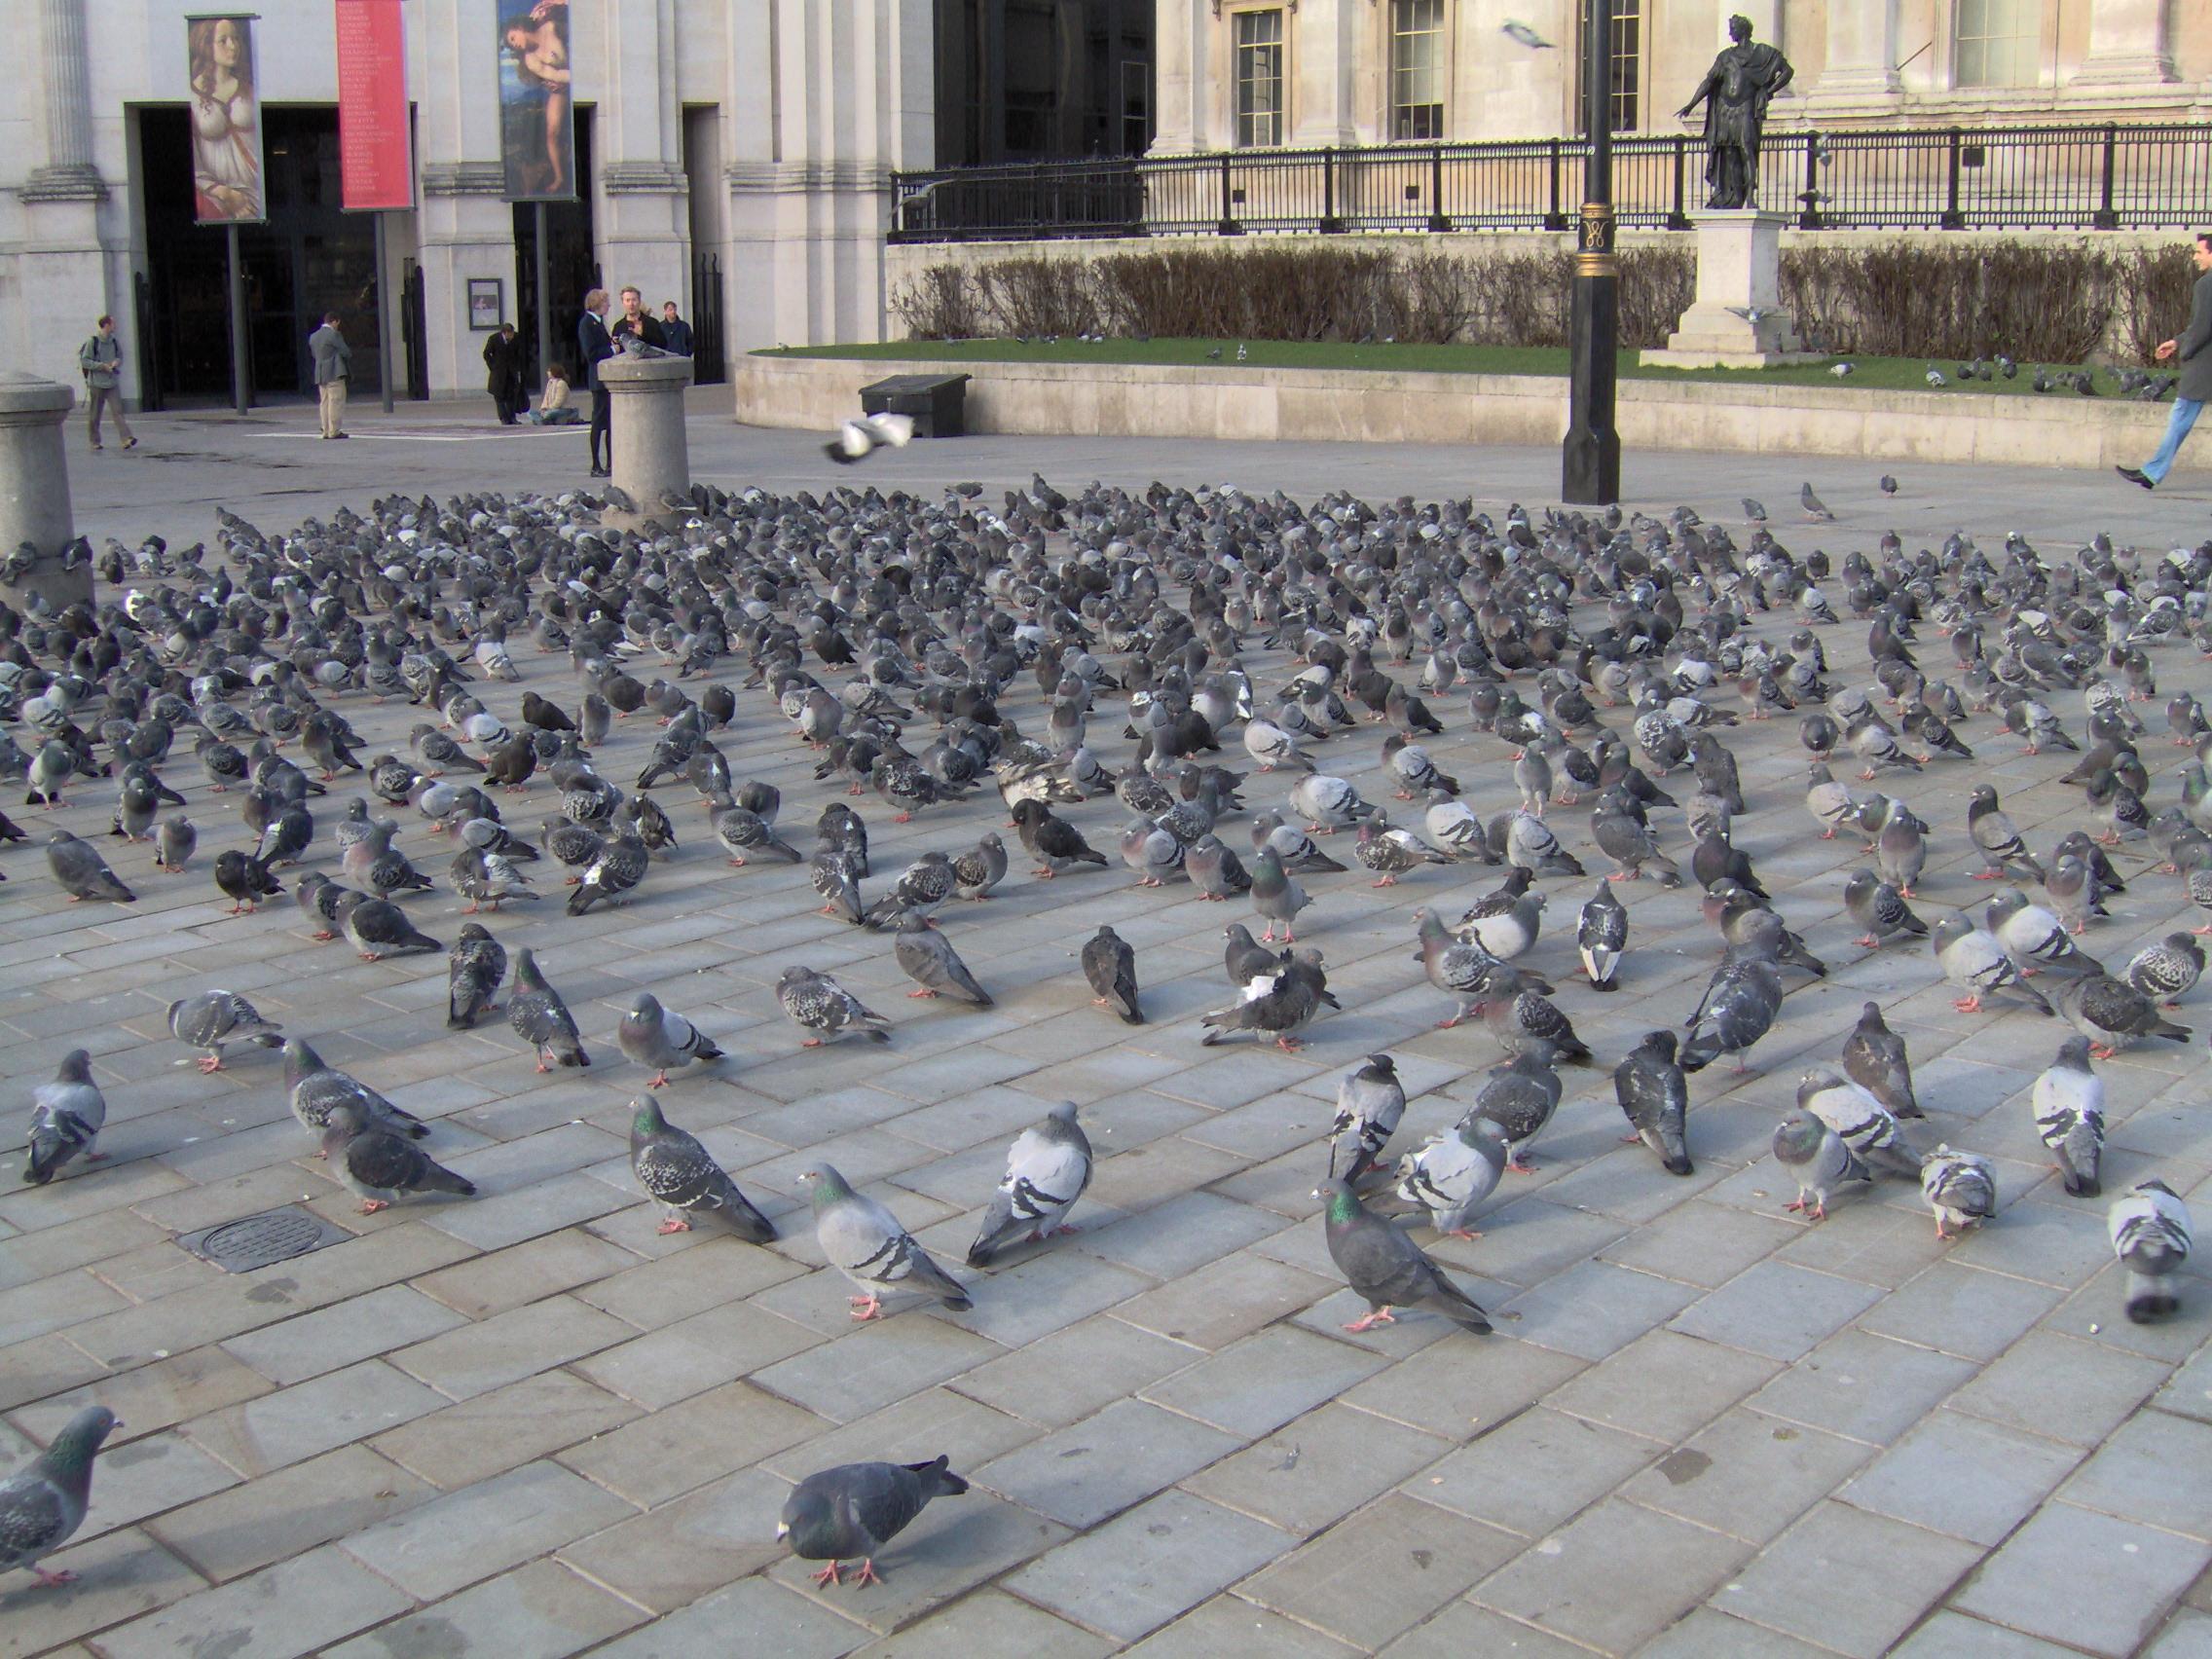 http://dic.academic.ru/pictures/wiki/files/80/PigeonsVermin.jpg